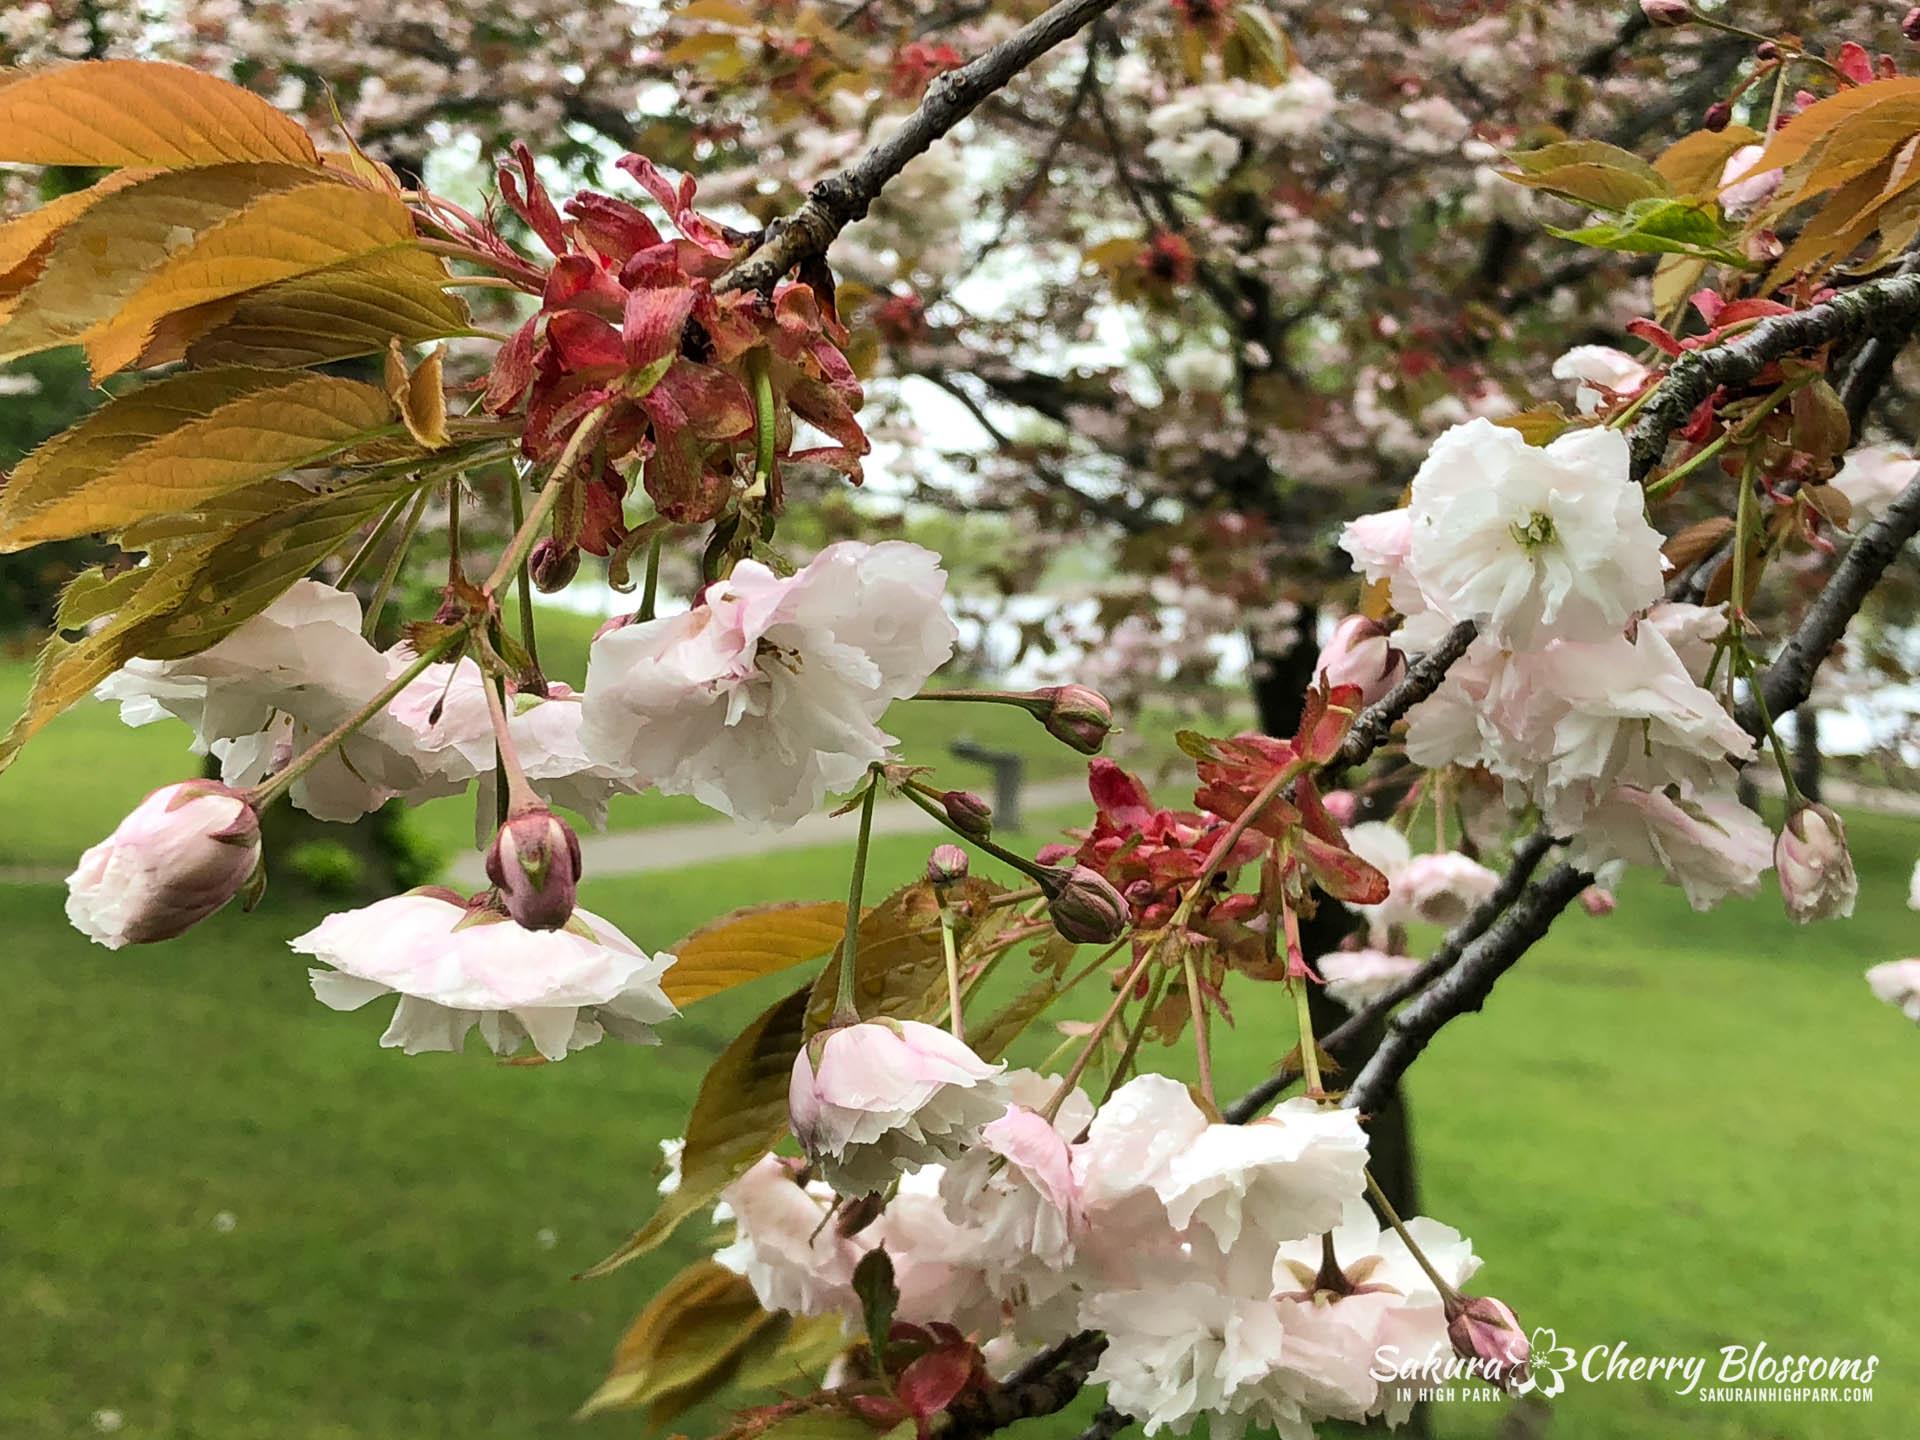 Sakura-Watch-May-22-2018-6.jpg